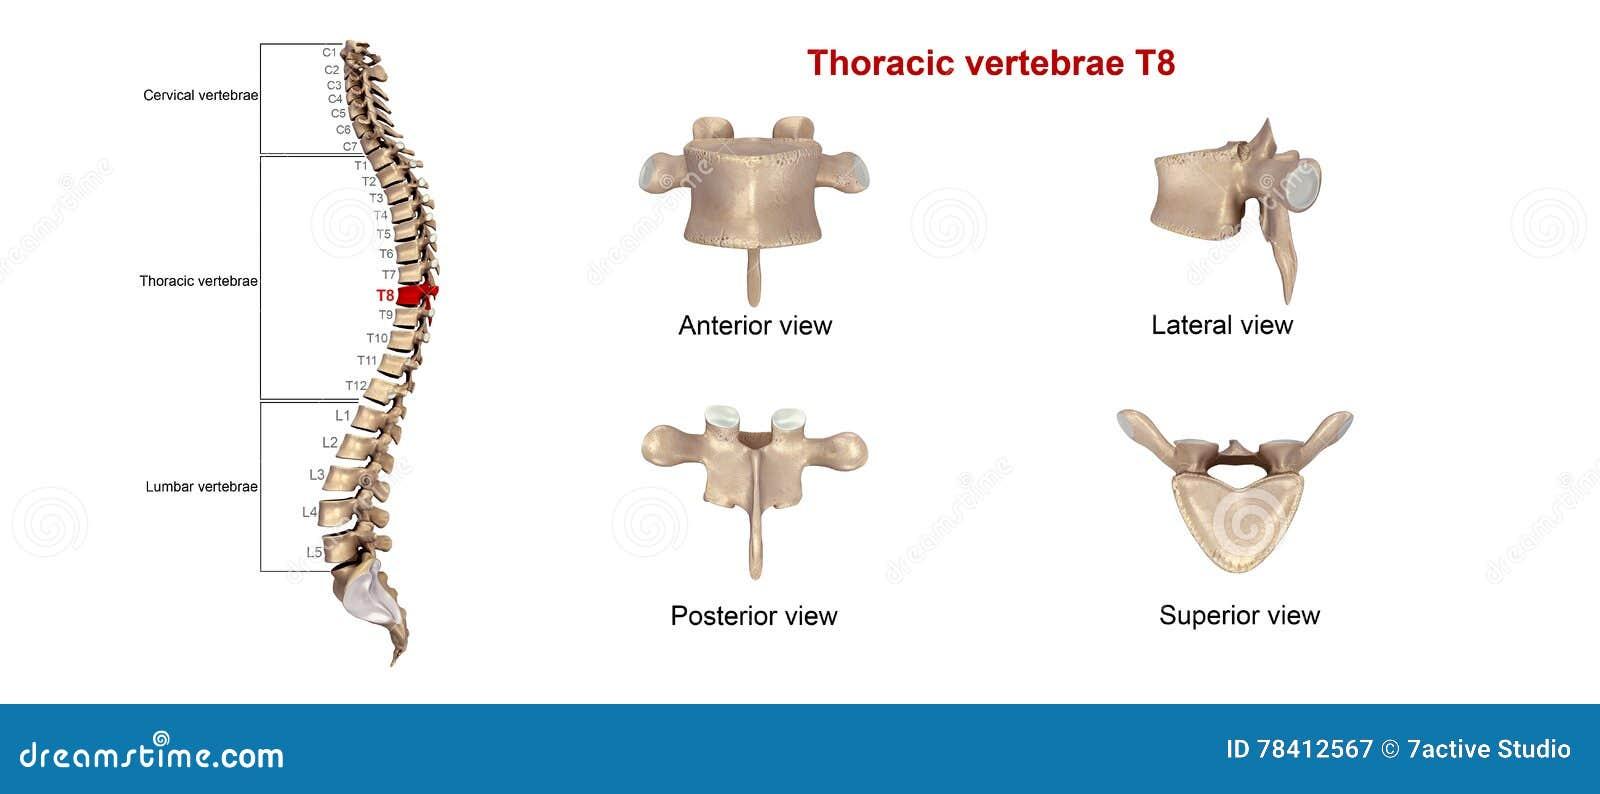 Thoracic vertebrae T8 stock illustration. Illustration of anatomy ...